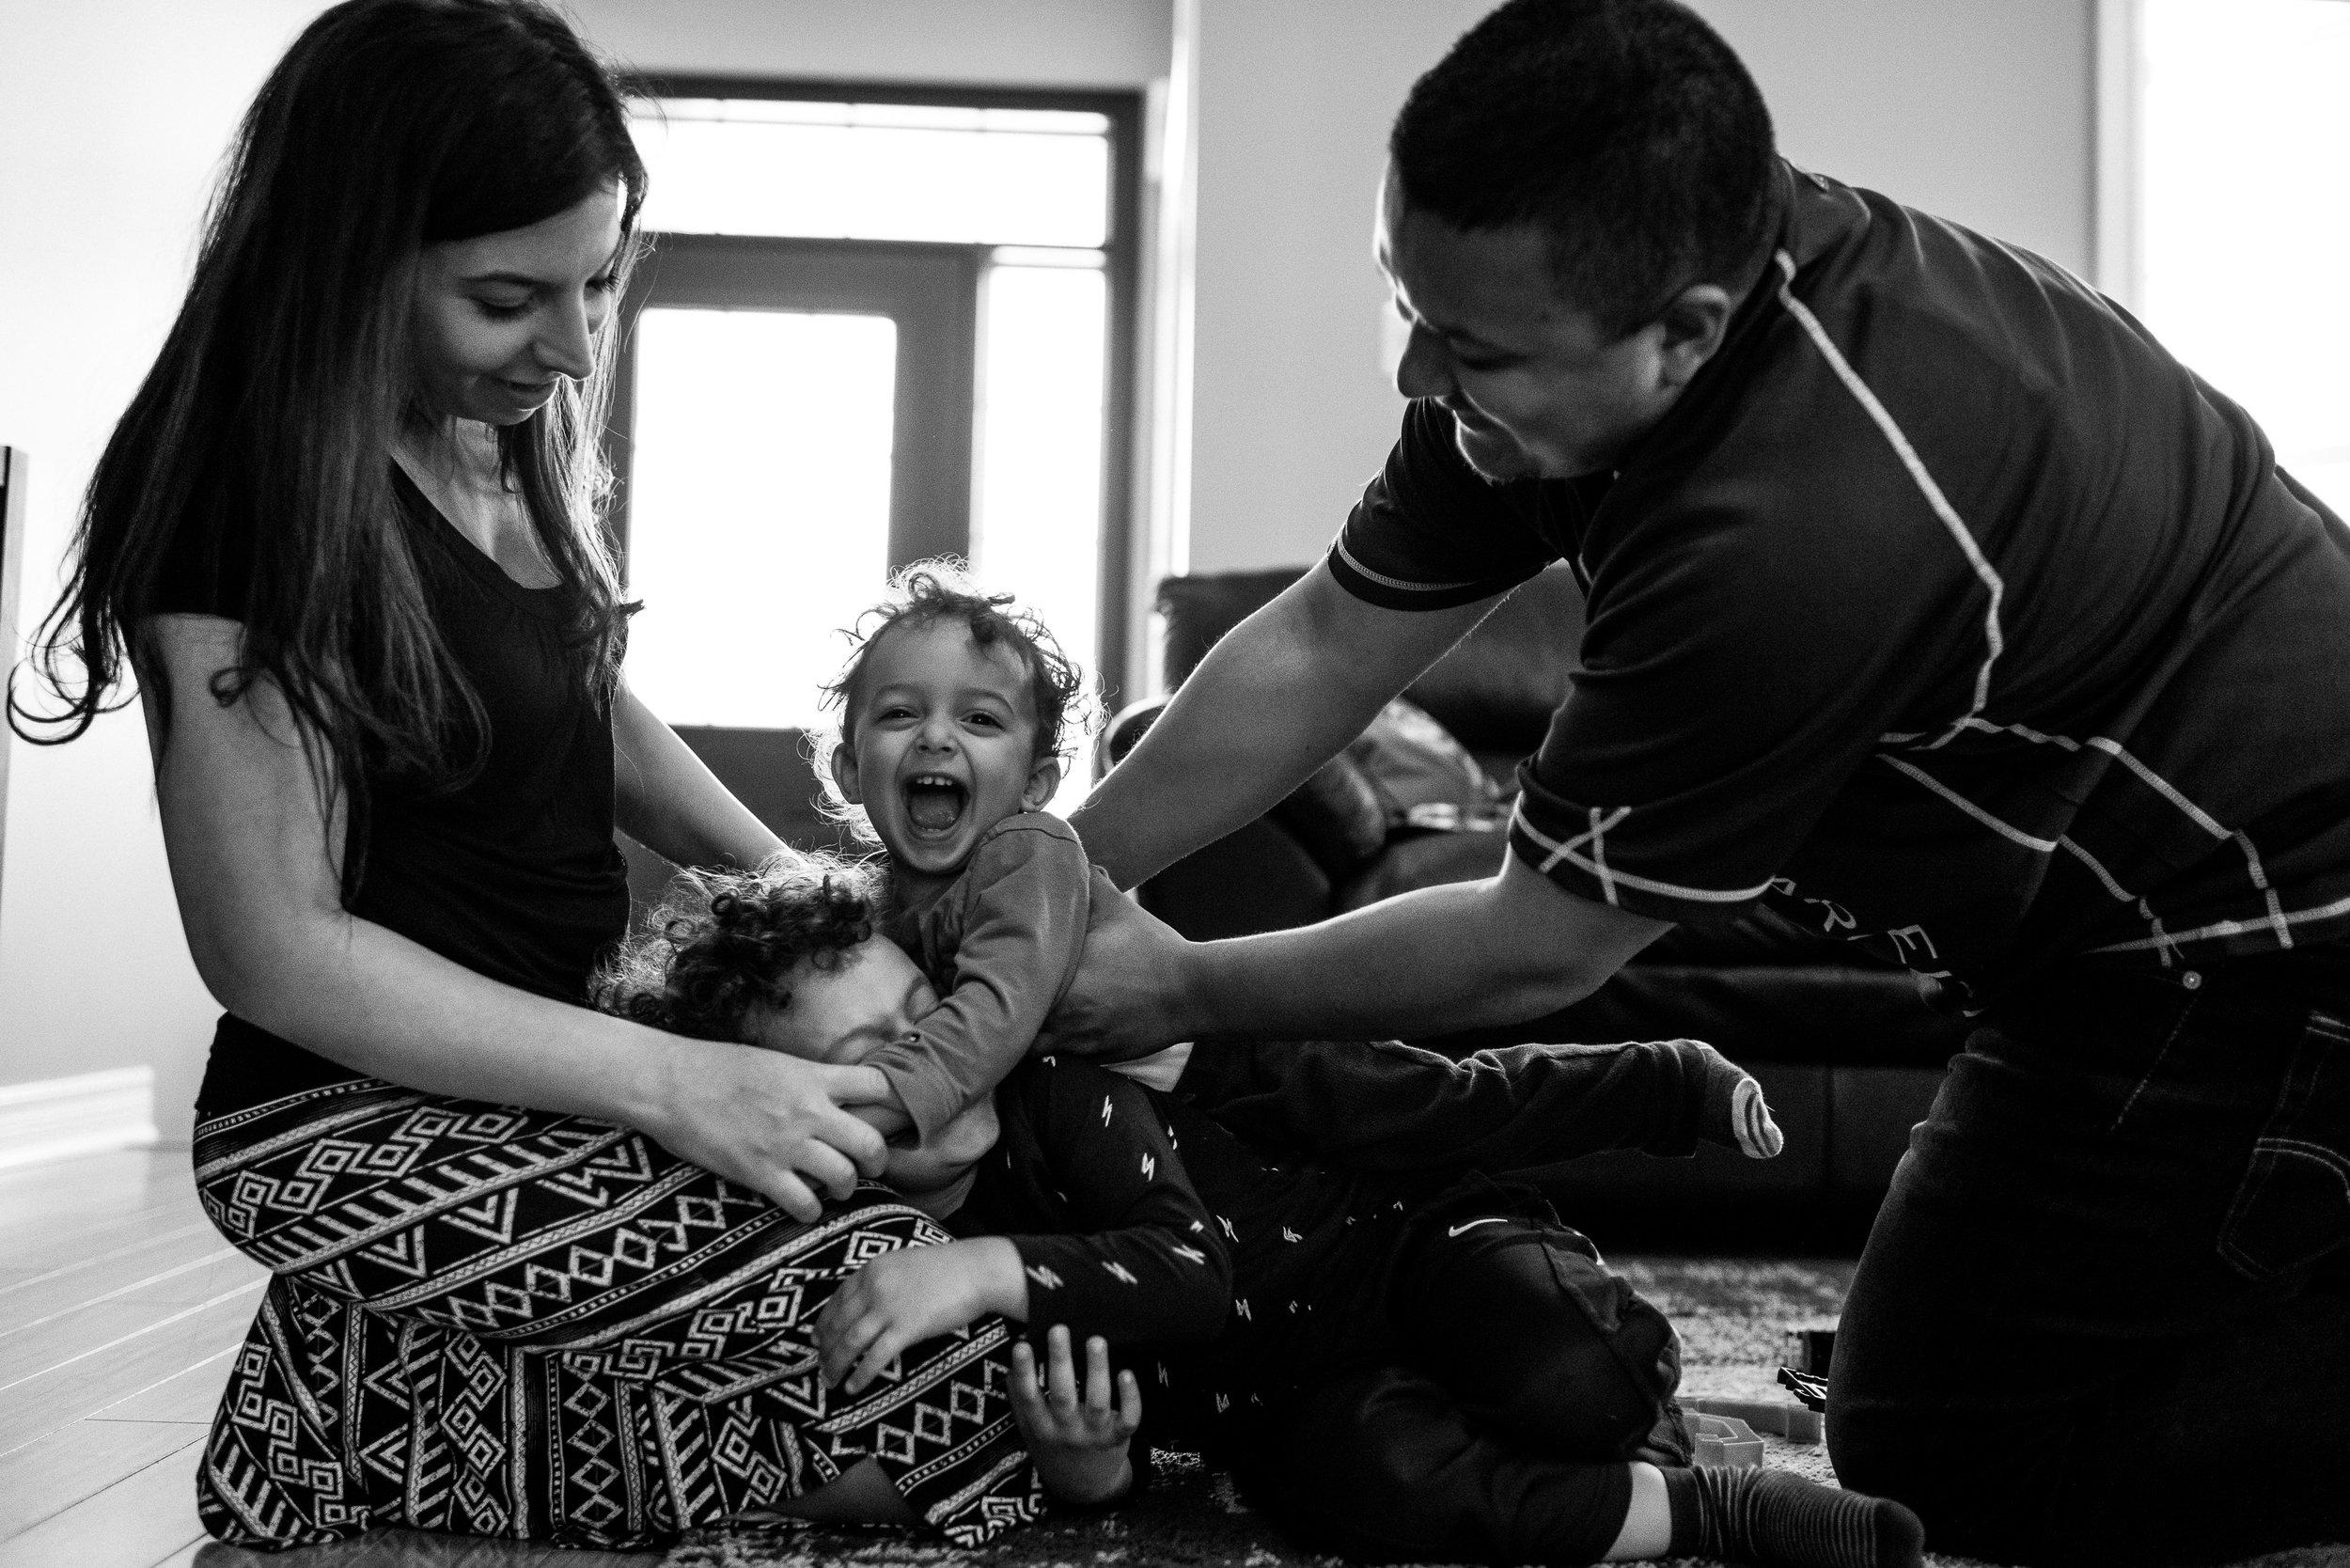 family documentary photography brampton -120538vm.jpg